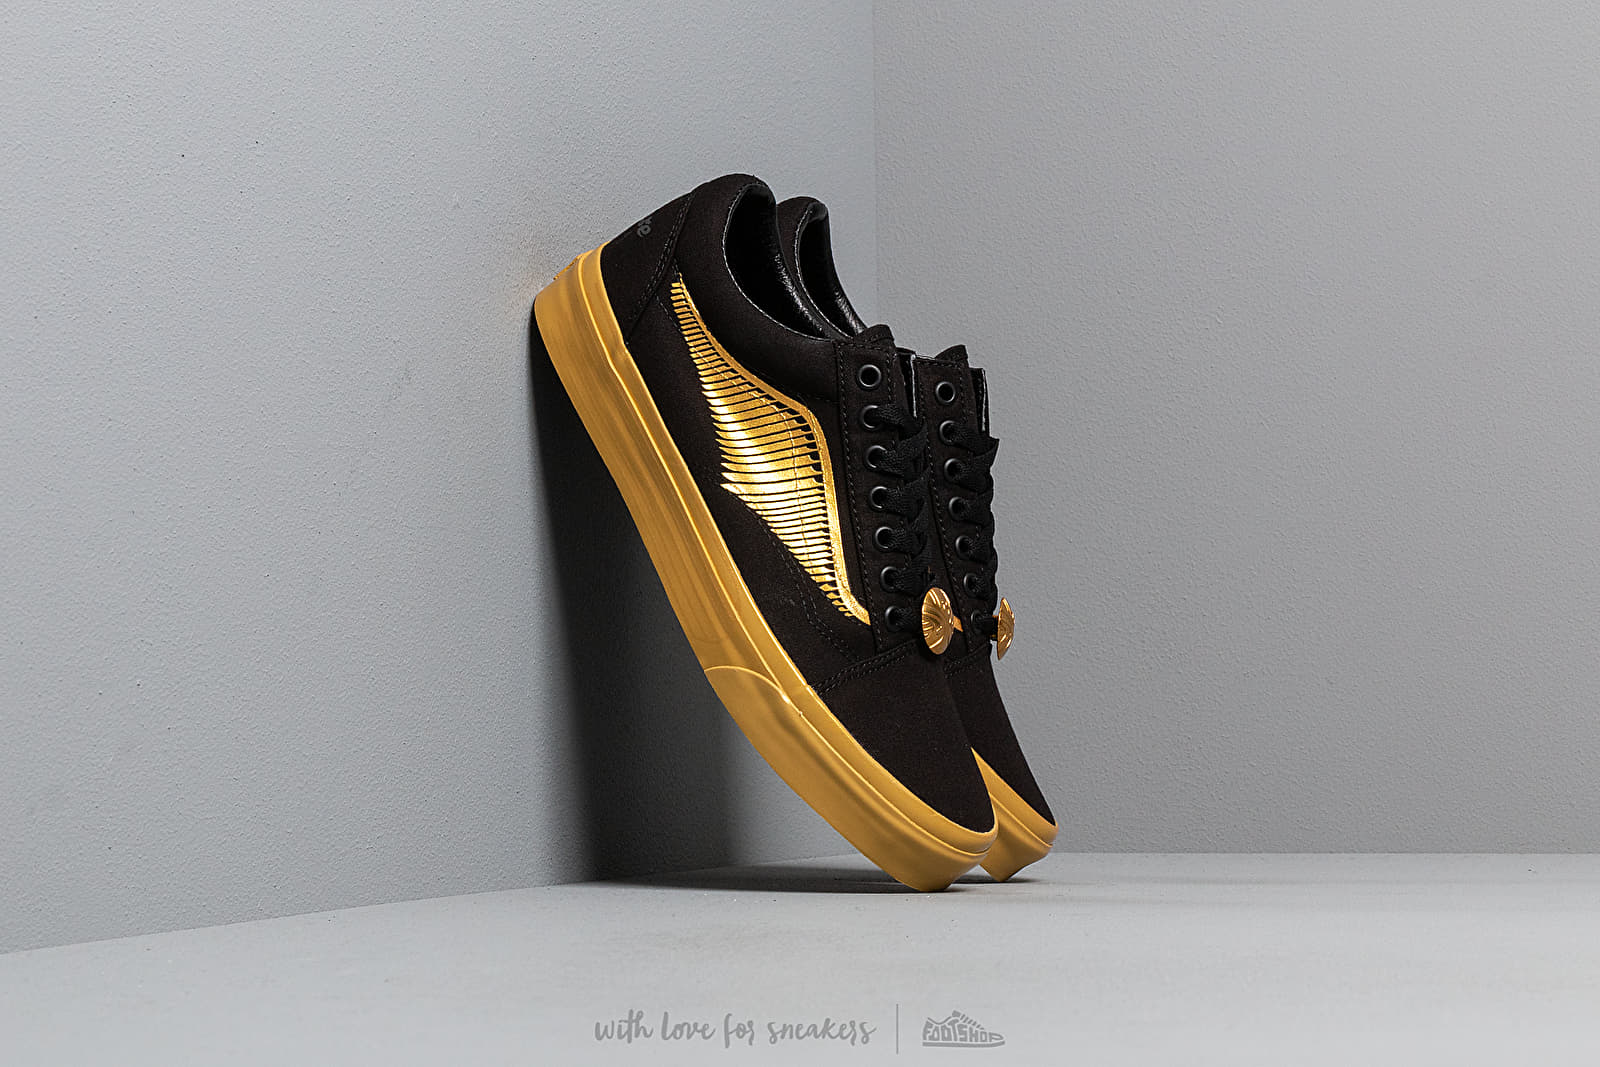 Vans x Harry Potter Old Skool Golden Snitch/ Black W super cenie 365 zł kupuj na Footshop.pl